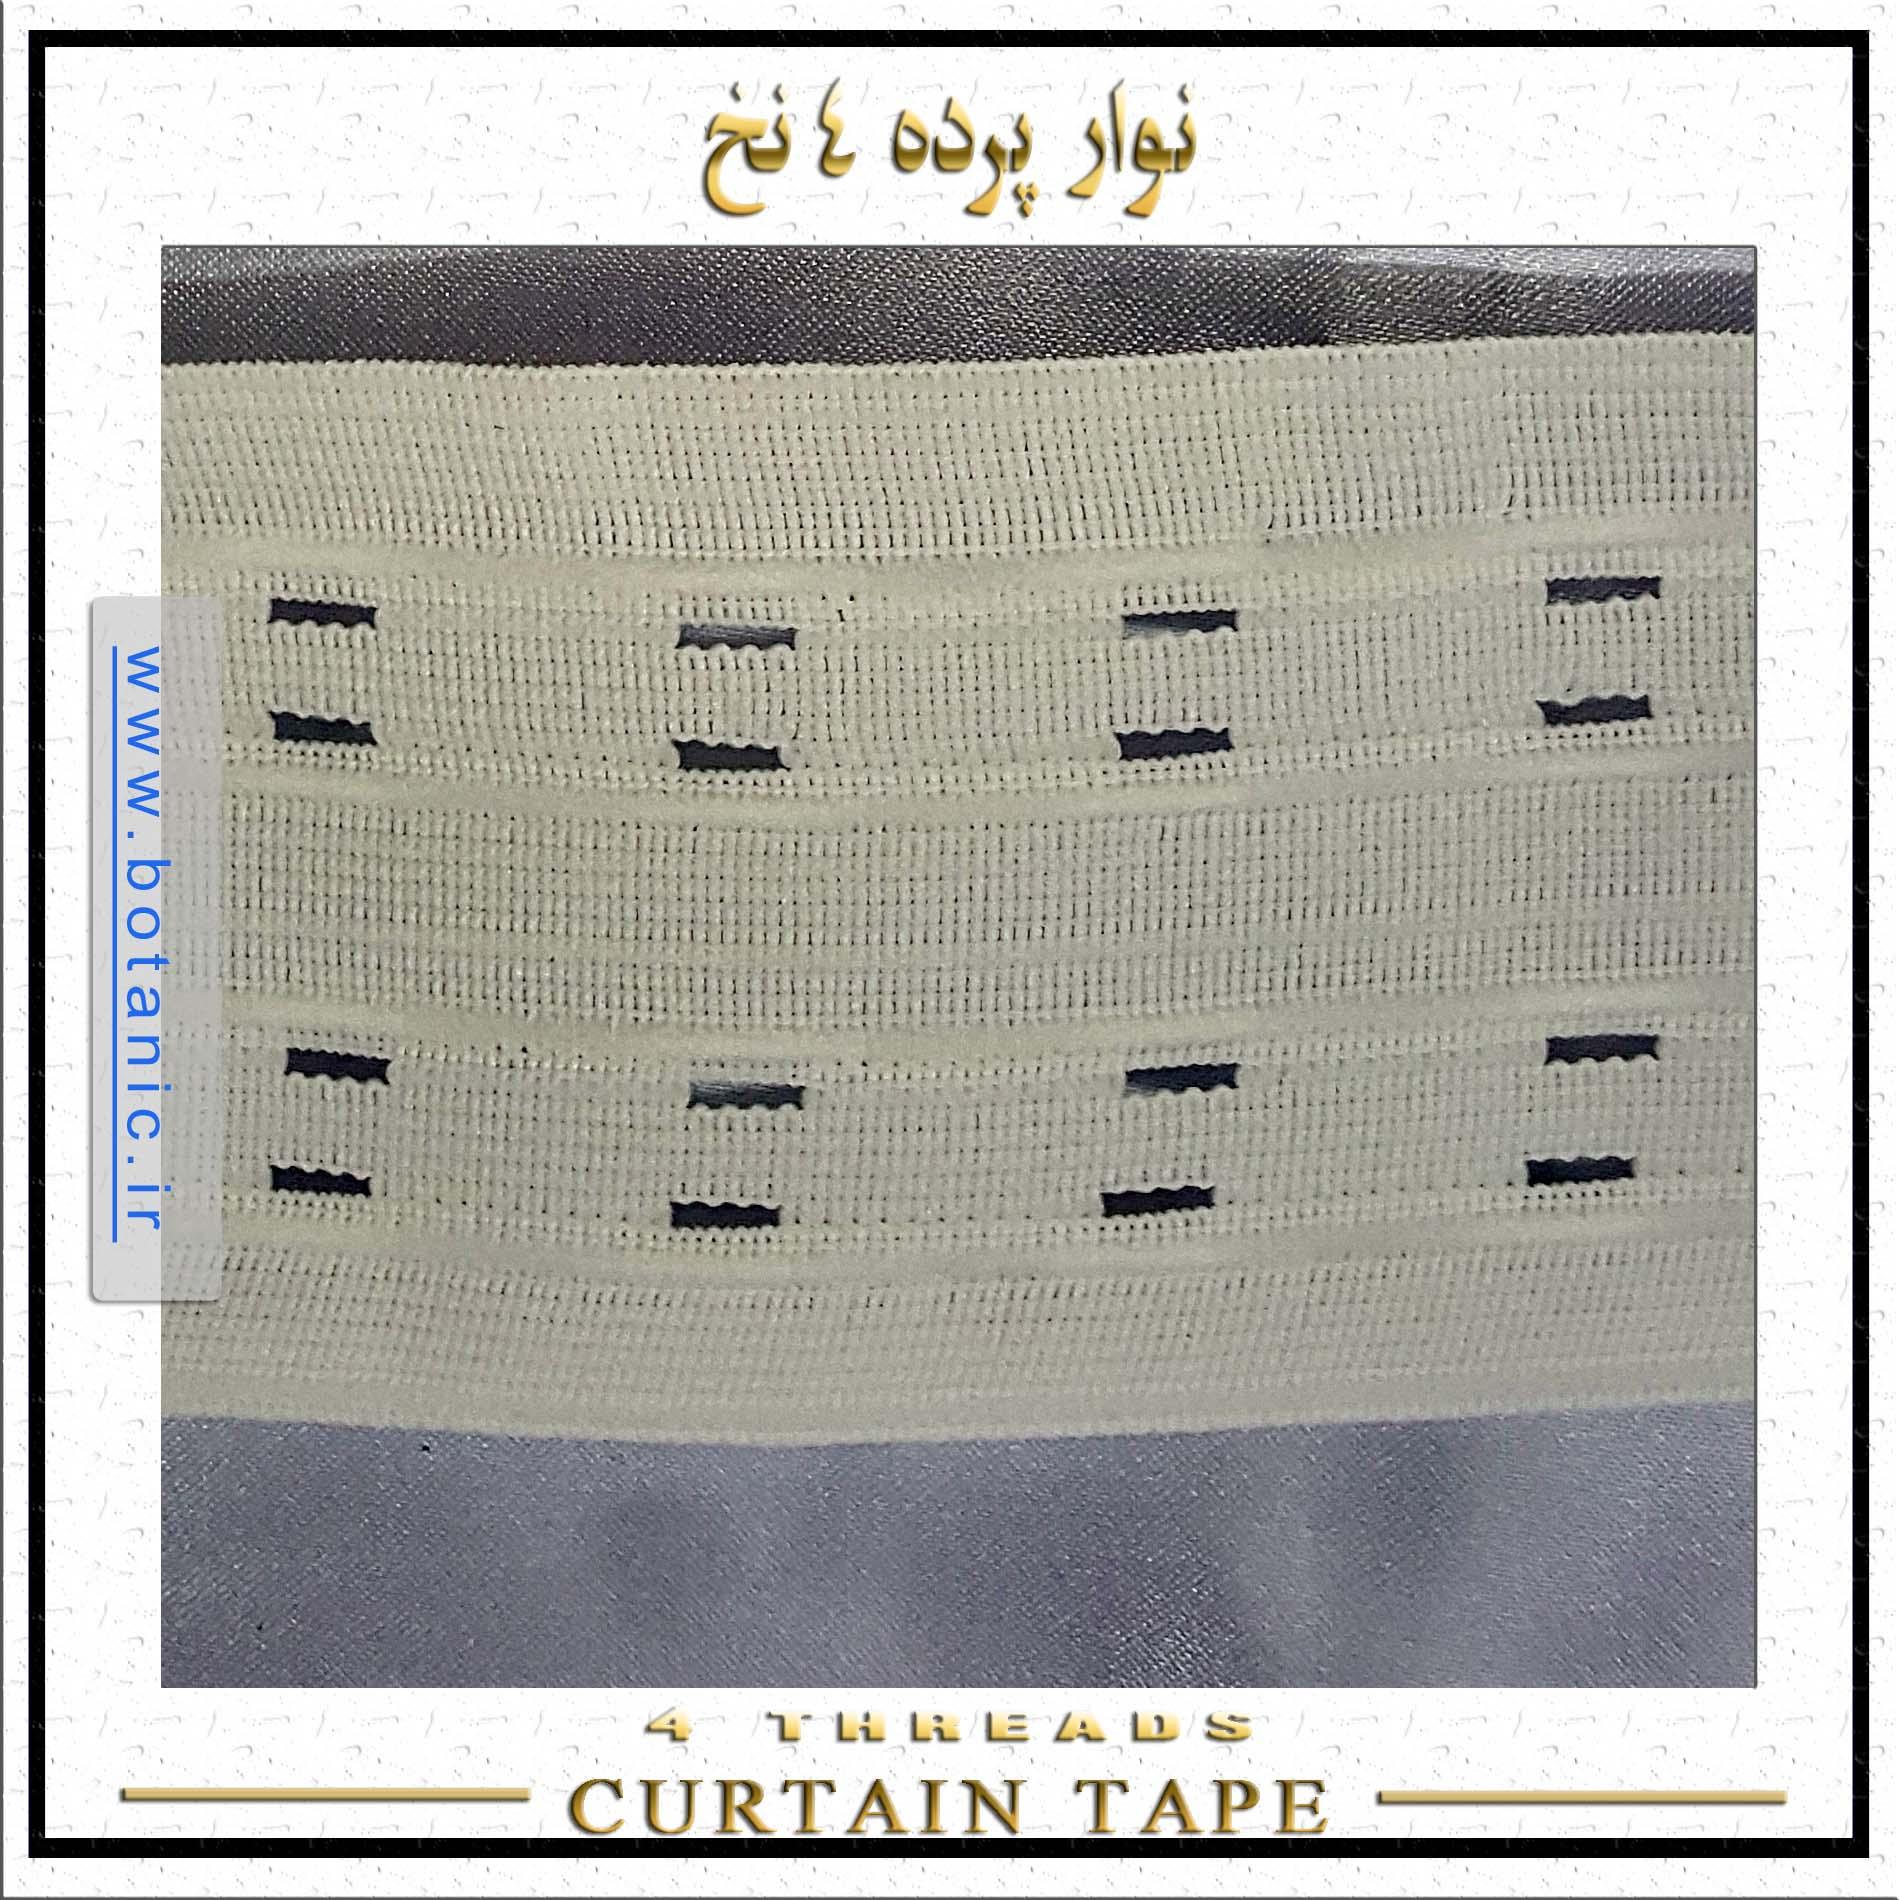 Curtain Tape 4 Threads